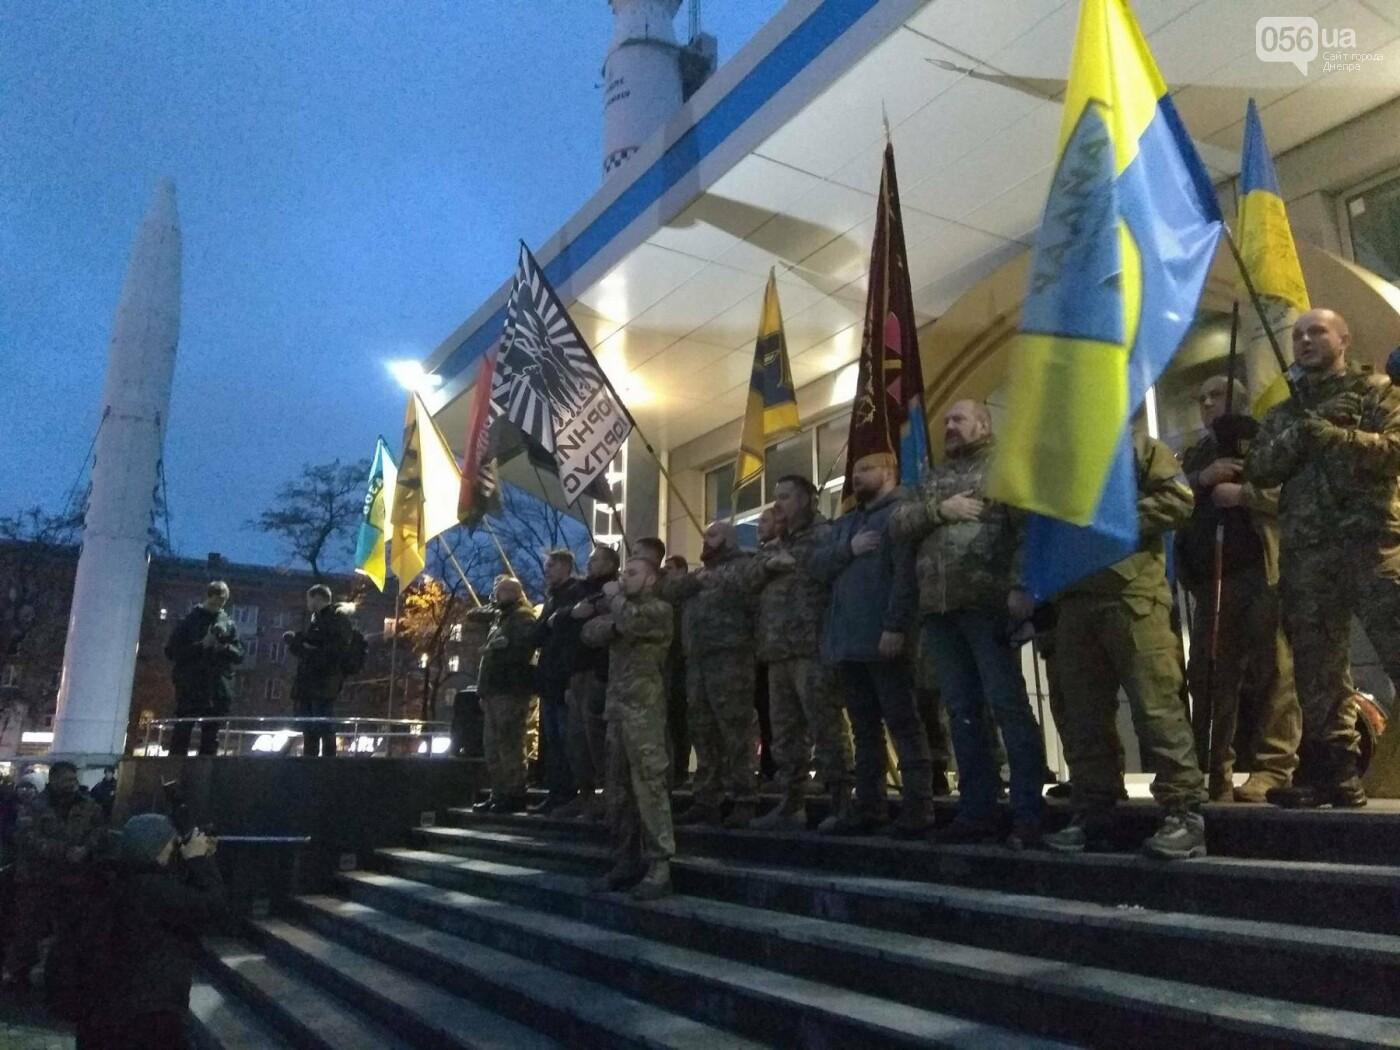 В центре Днепра прошла колонна добровольцев АТО (ФОТО, ВИДЕО), фото-7